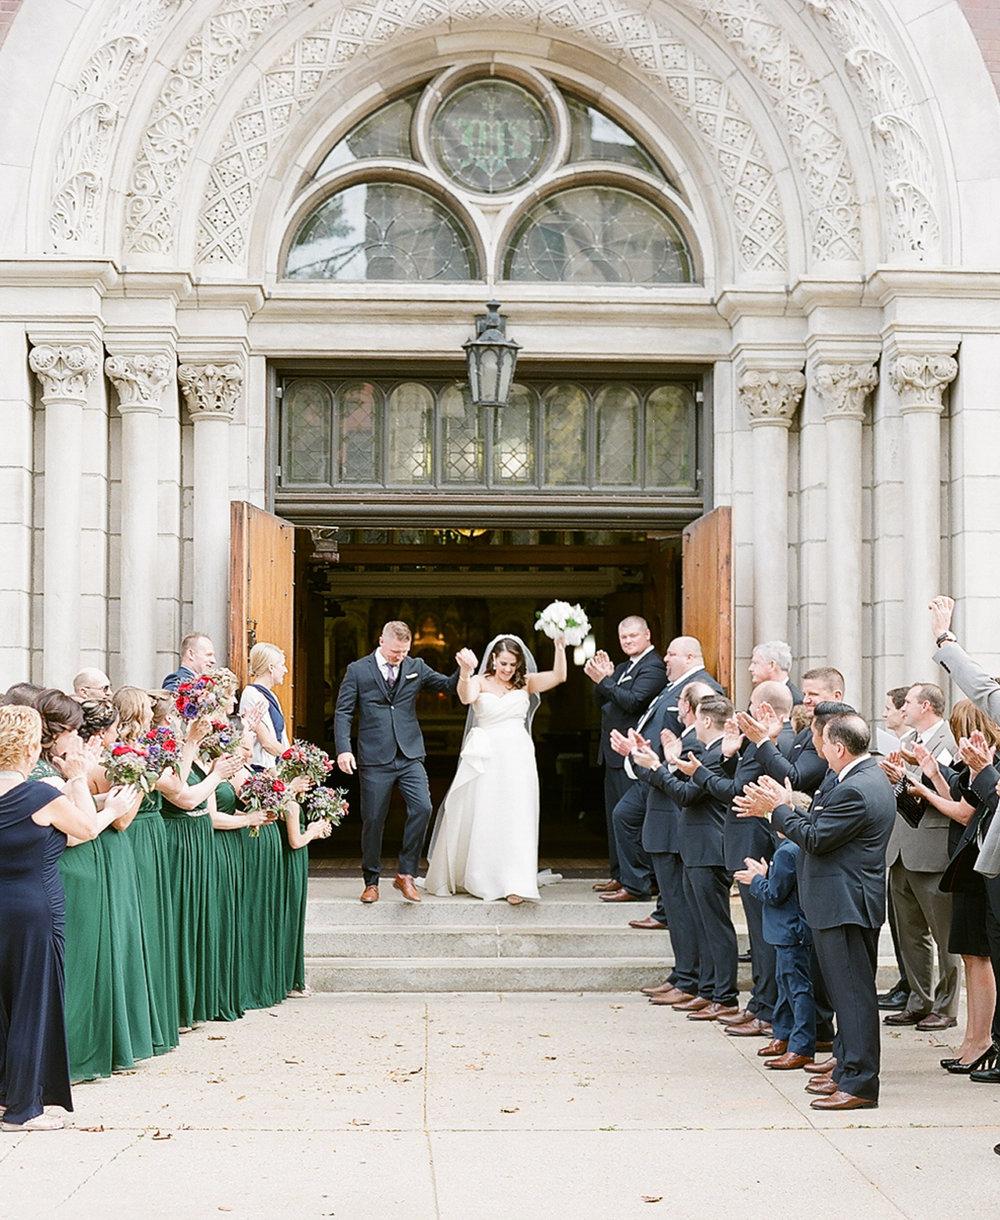 Bonphotage Fine Art Wedding Photography - St. Michael's Church, Old Town Chicago